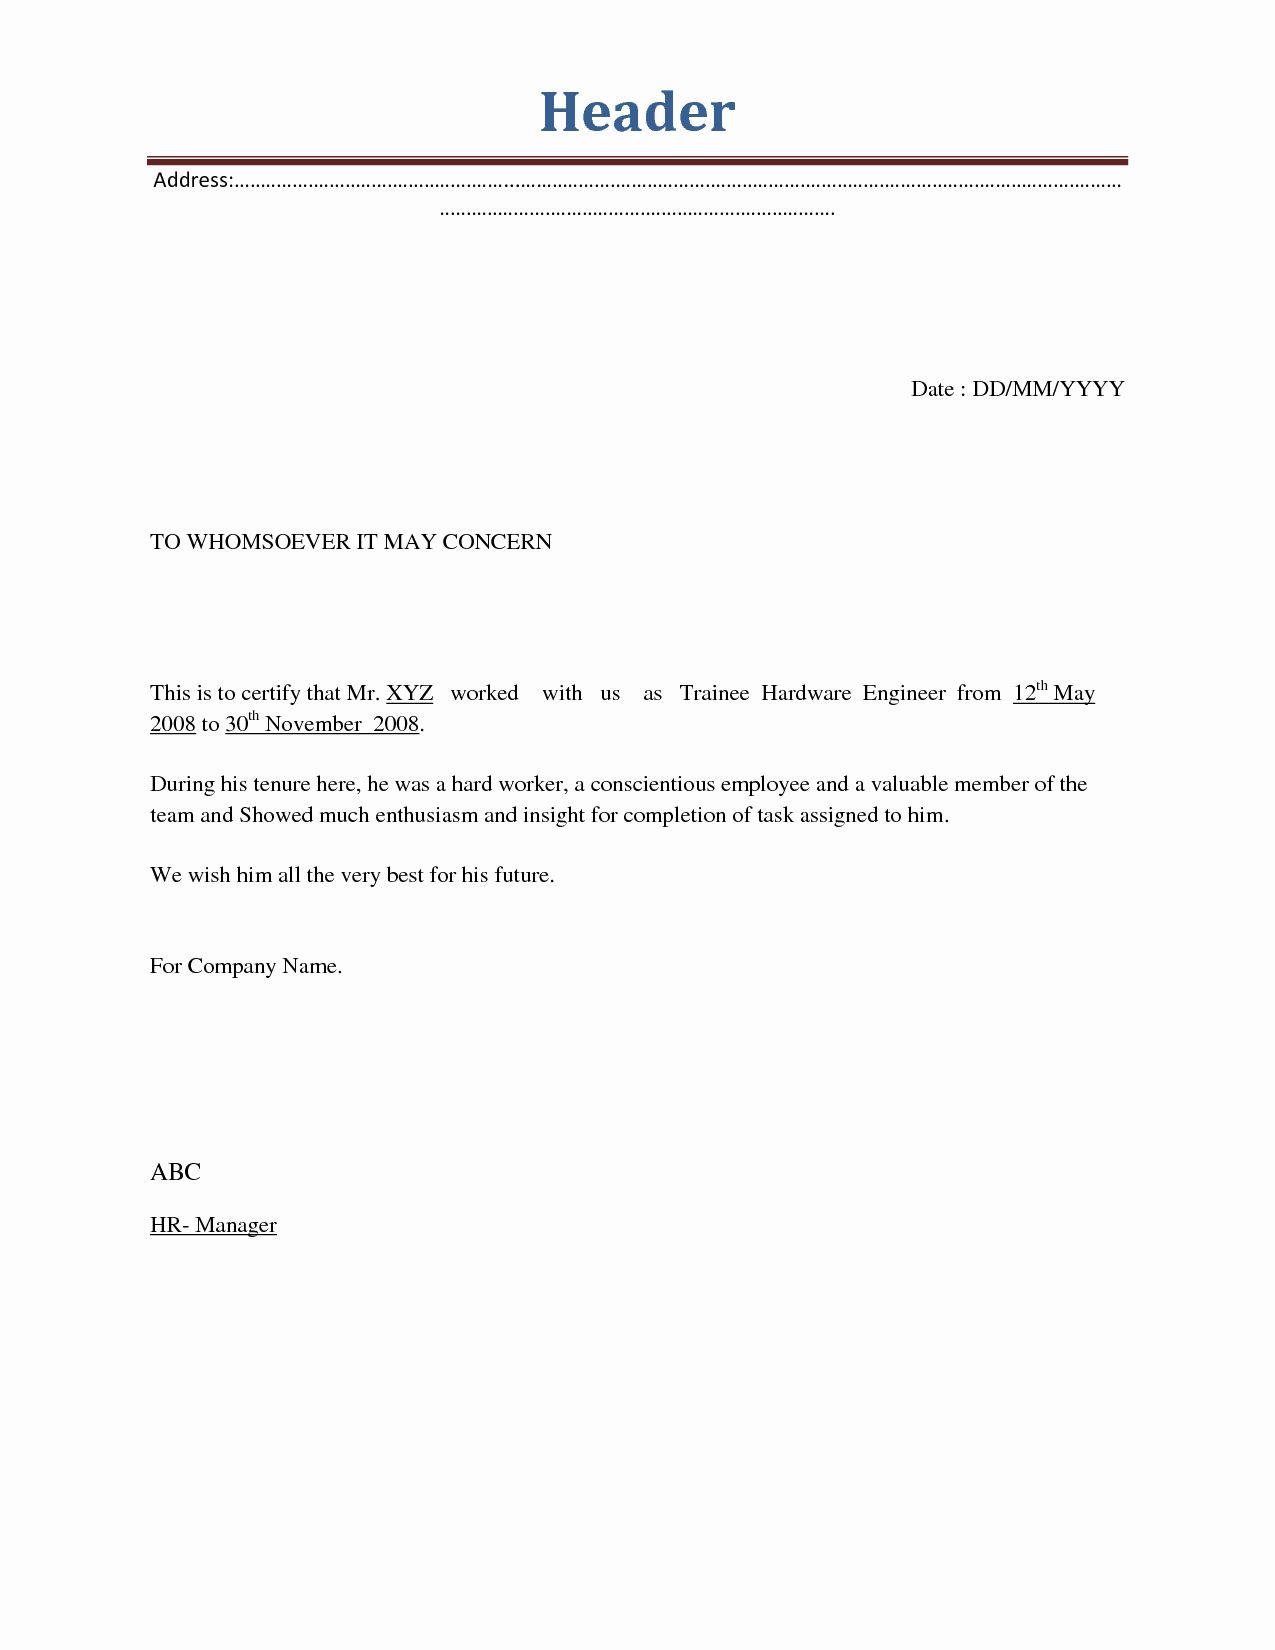 Free Employment Termination Forms Elegant Employee Termination Letter Sample Lettering Letter Templates Letter Templates Free Termination of employment letter template